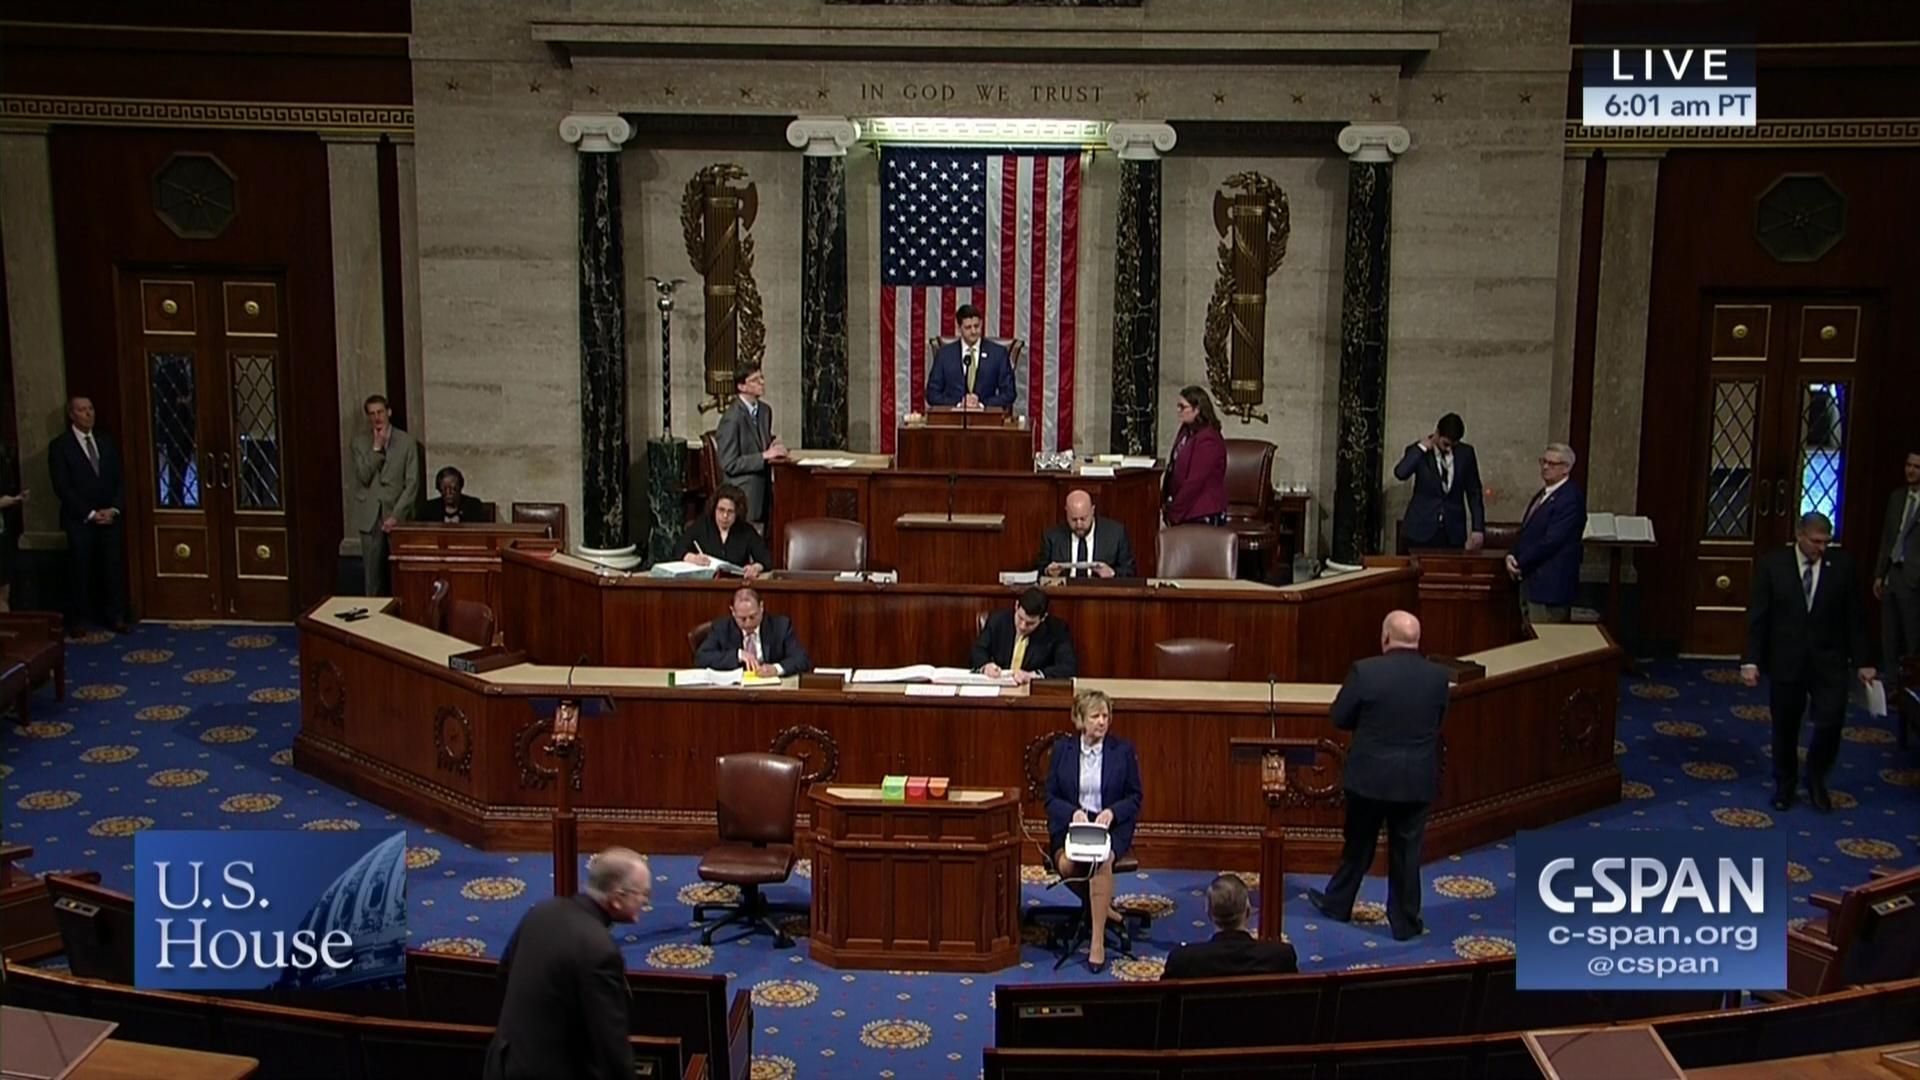 House Debates Federal Reserve Bill, Apr 13 2018 | Video | C-SPAN.org